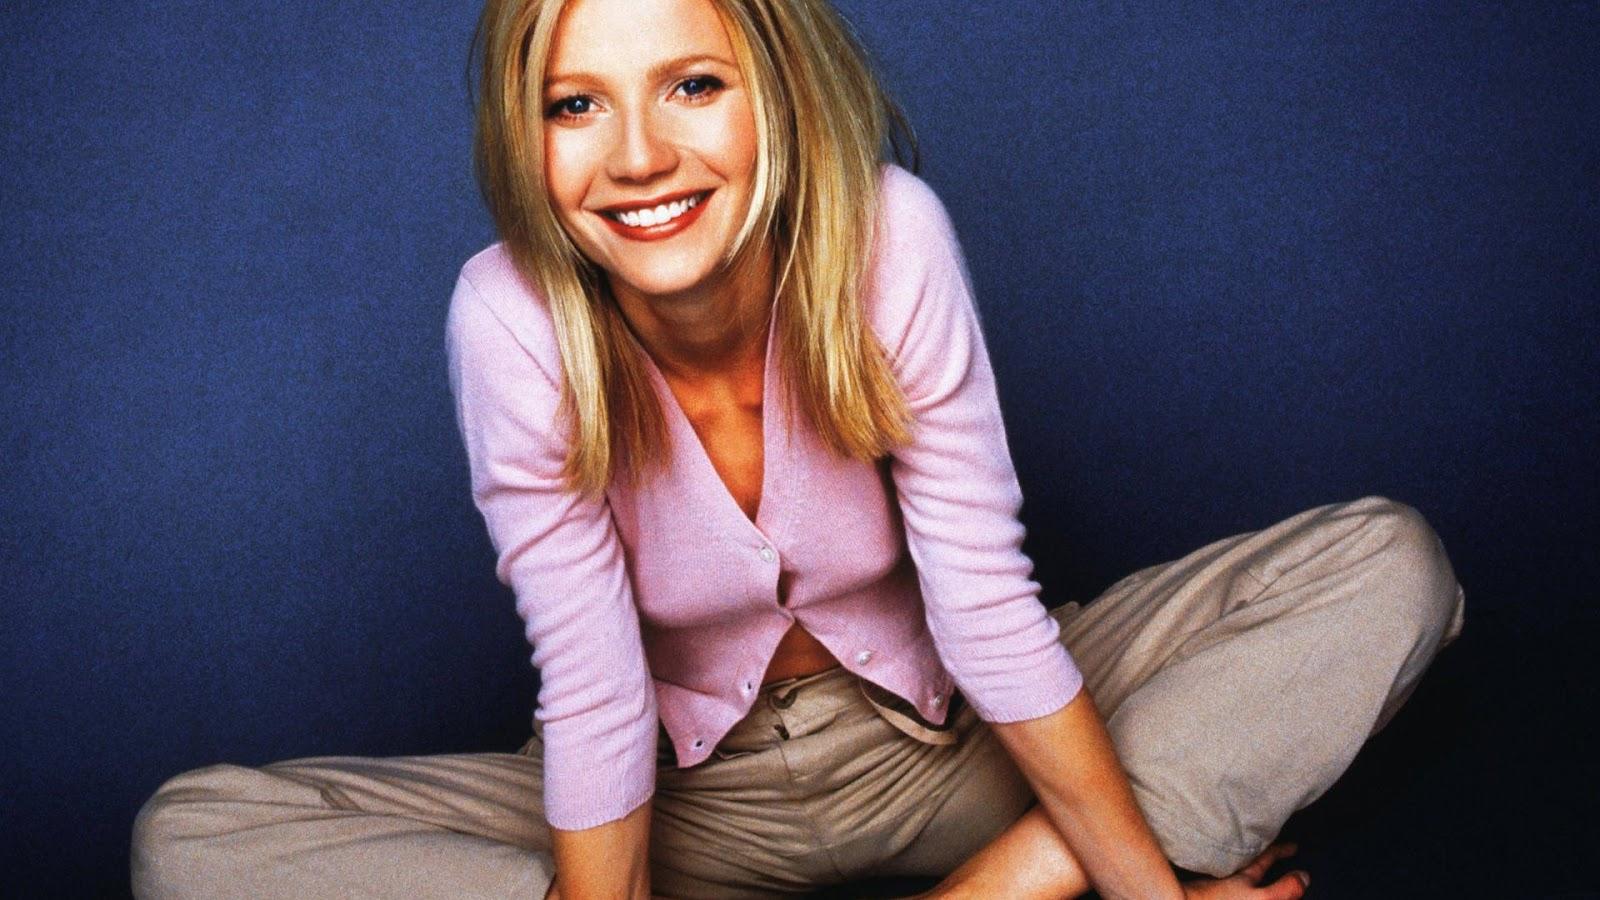 http://3.bp.blogspot.com/-PV0w-BdRWis/UAvHtq17B9I/AAAAAAAAAm8/Id5aiEg7n2M/s1600/Gwyneth-Paltrow-Free-HD-Wallpapers-gwyneth-paltrow-hd-1920x1080.jpg